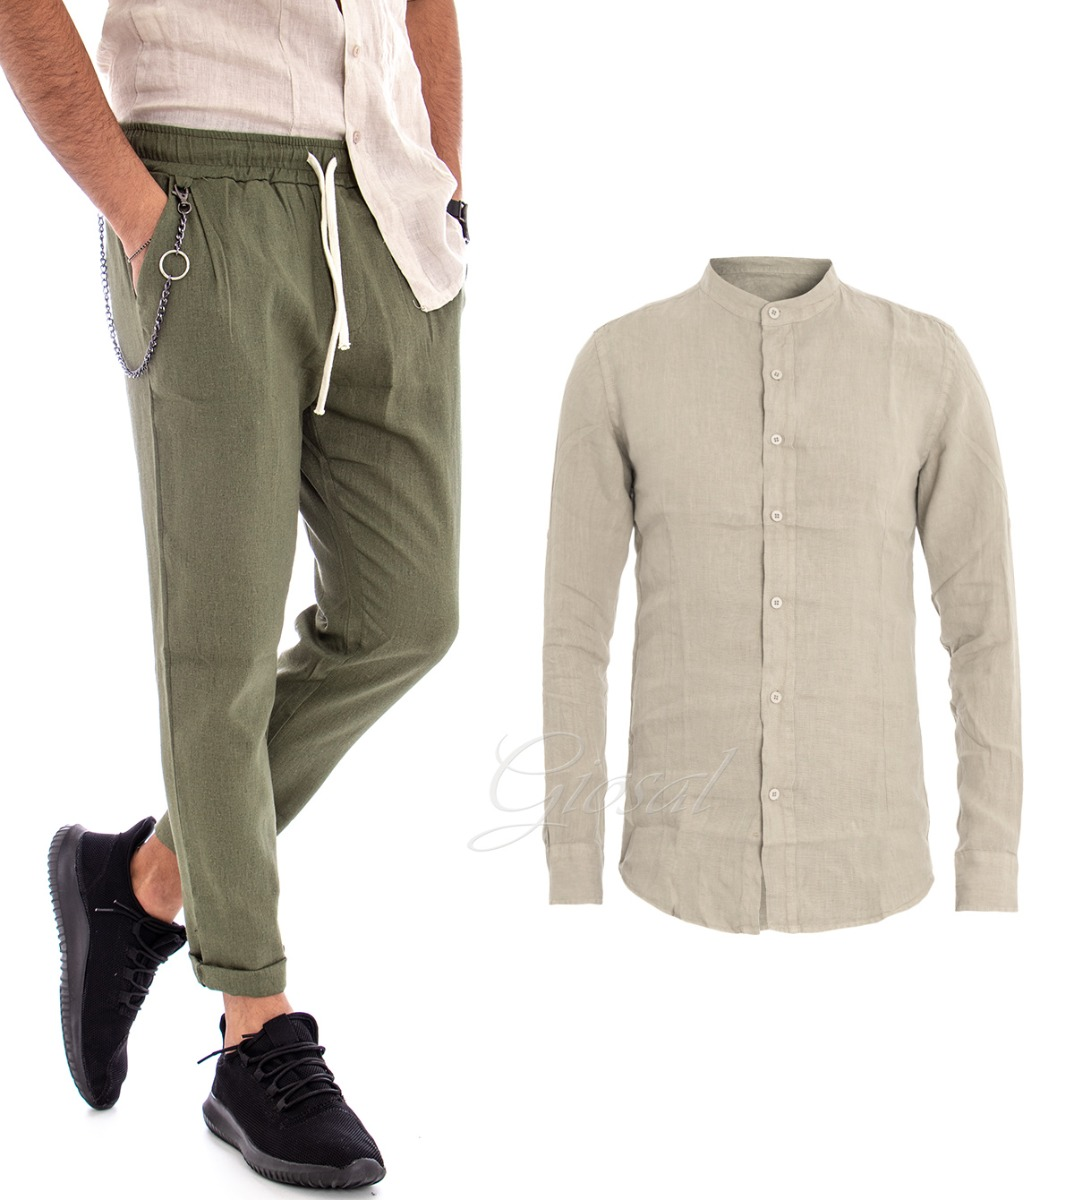 buy online 37b4b ea2be Details zu Komplett Hemd Beige Hose Grün Herren Outfit Leinen Einfarbig  Casual Gi